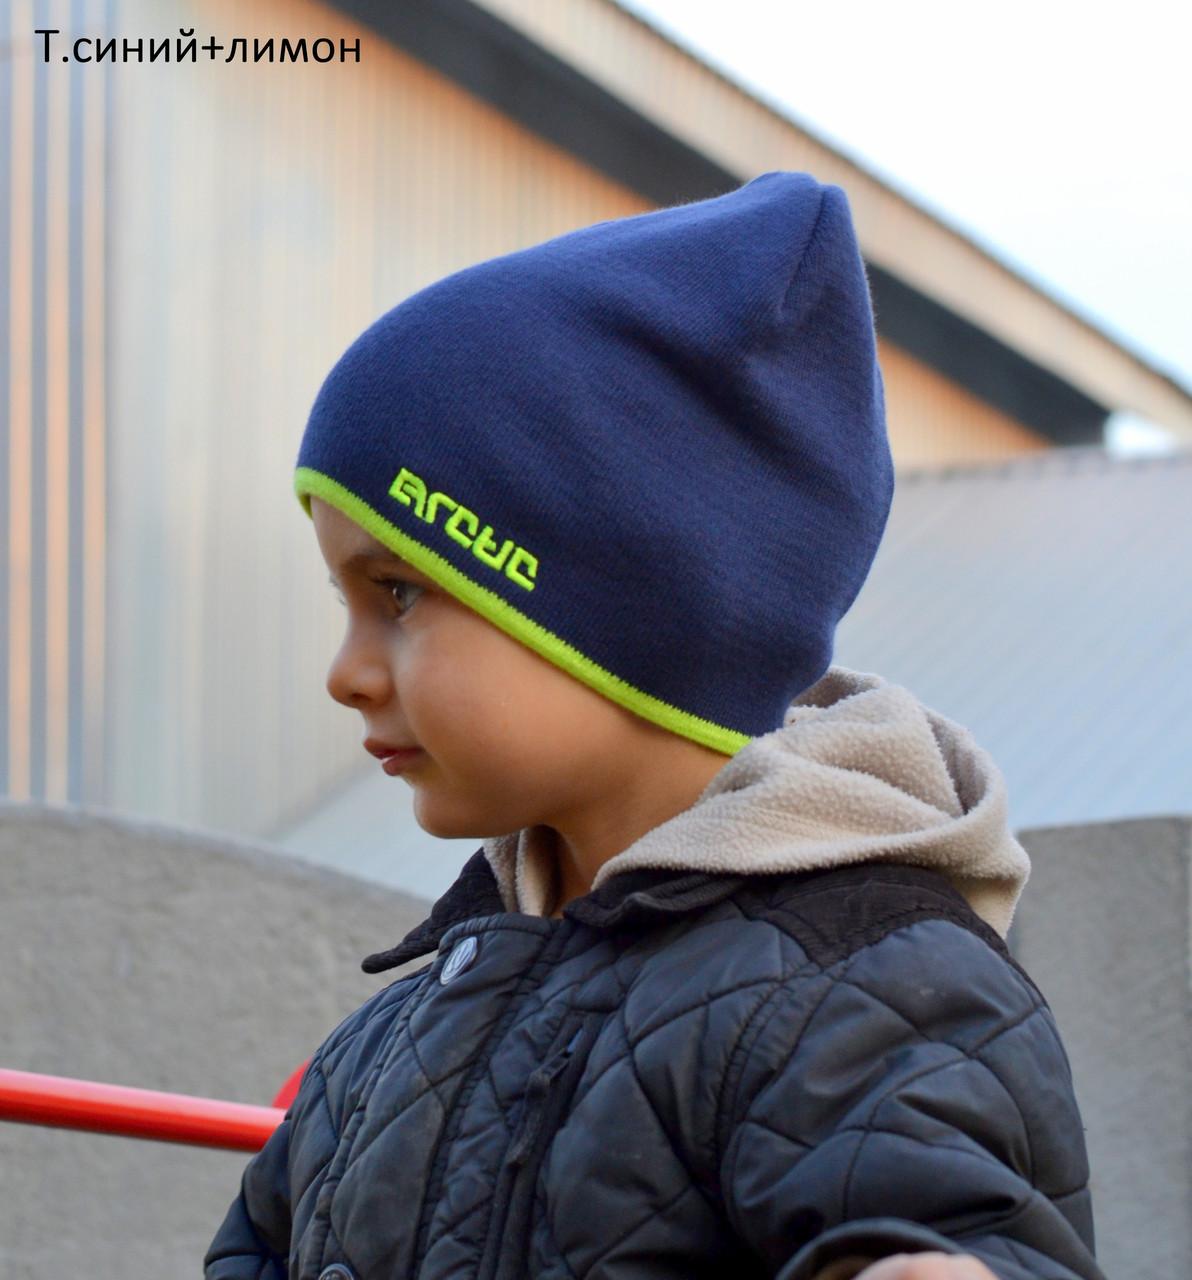 004 Авангард. Двойная шапка, х/б. 2-5 лет (р.48-52) Т.роз,т.син+лимон,электрик, т.сер+лимон, т.сер+сер,красный